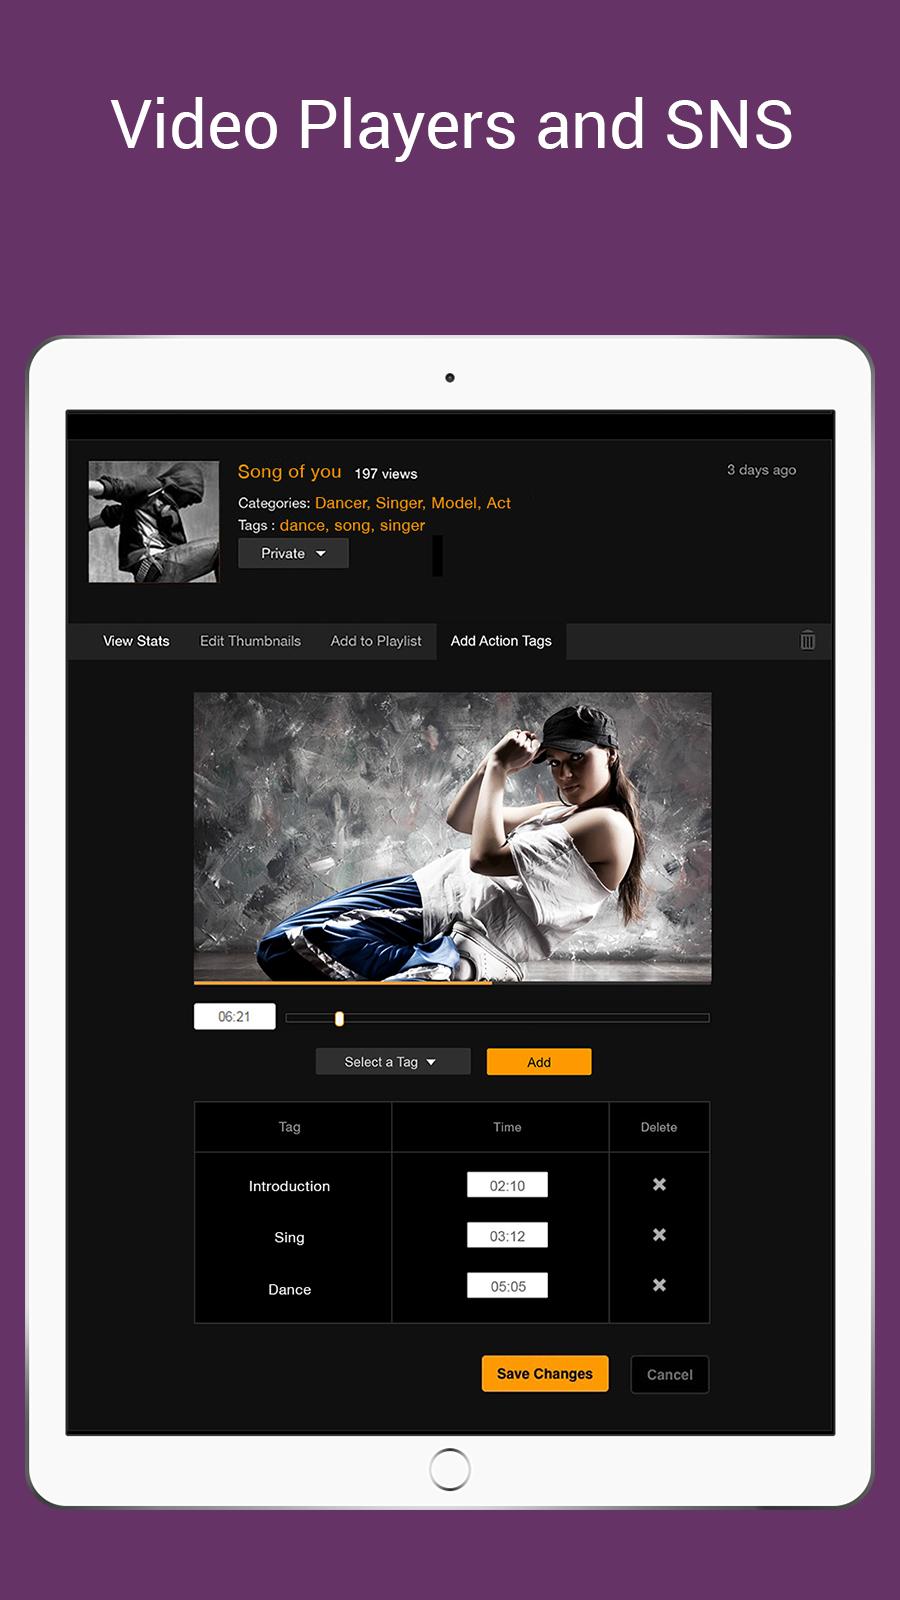 Video Player snd SNS sites